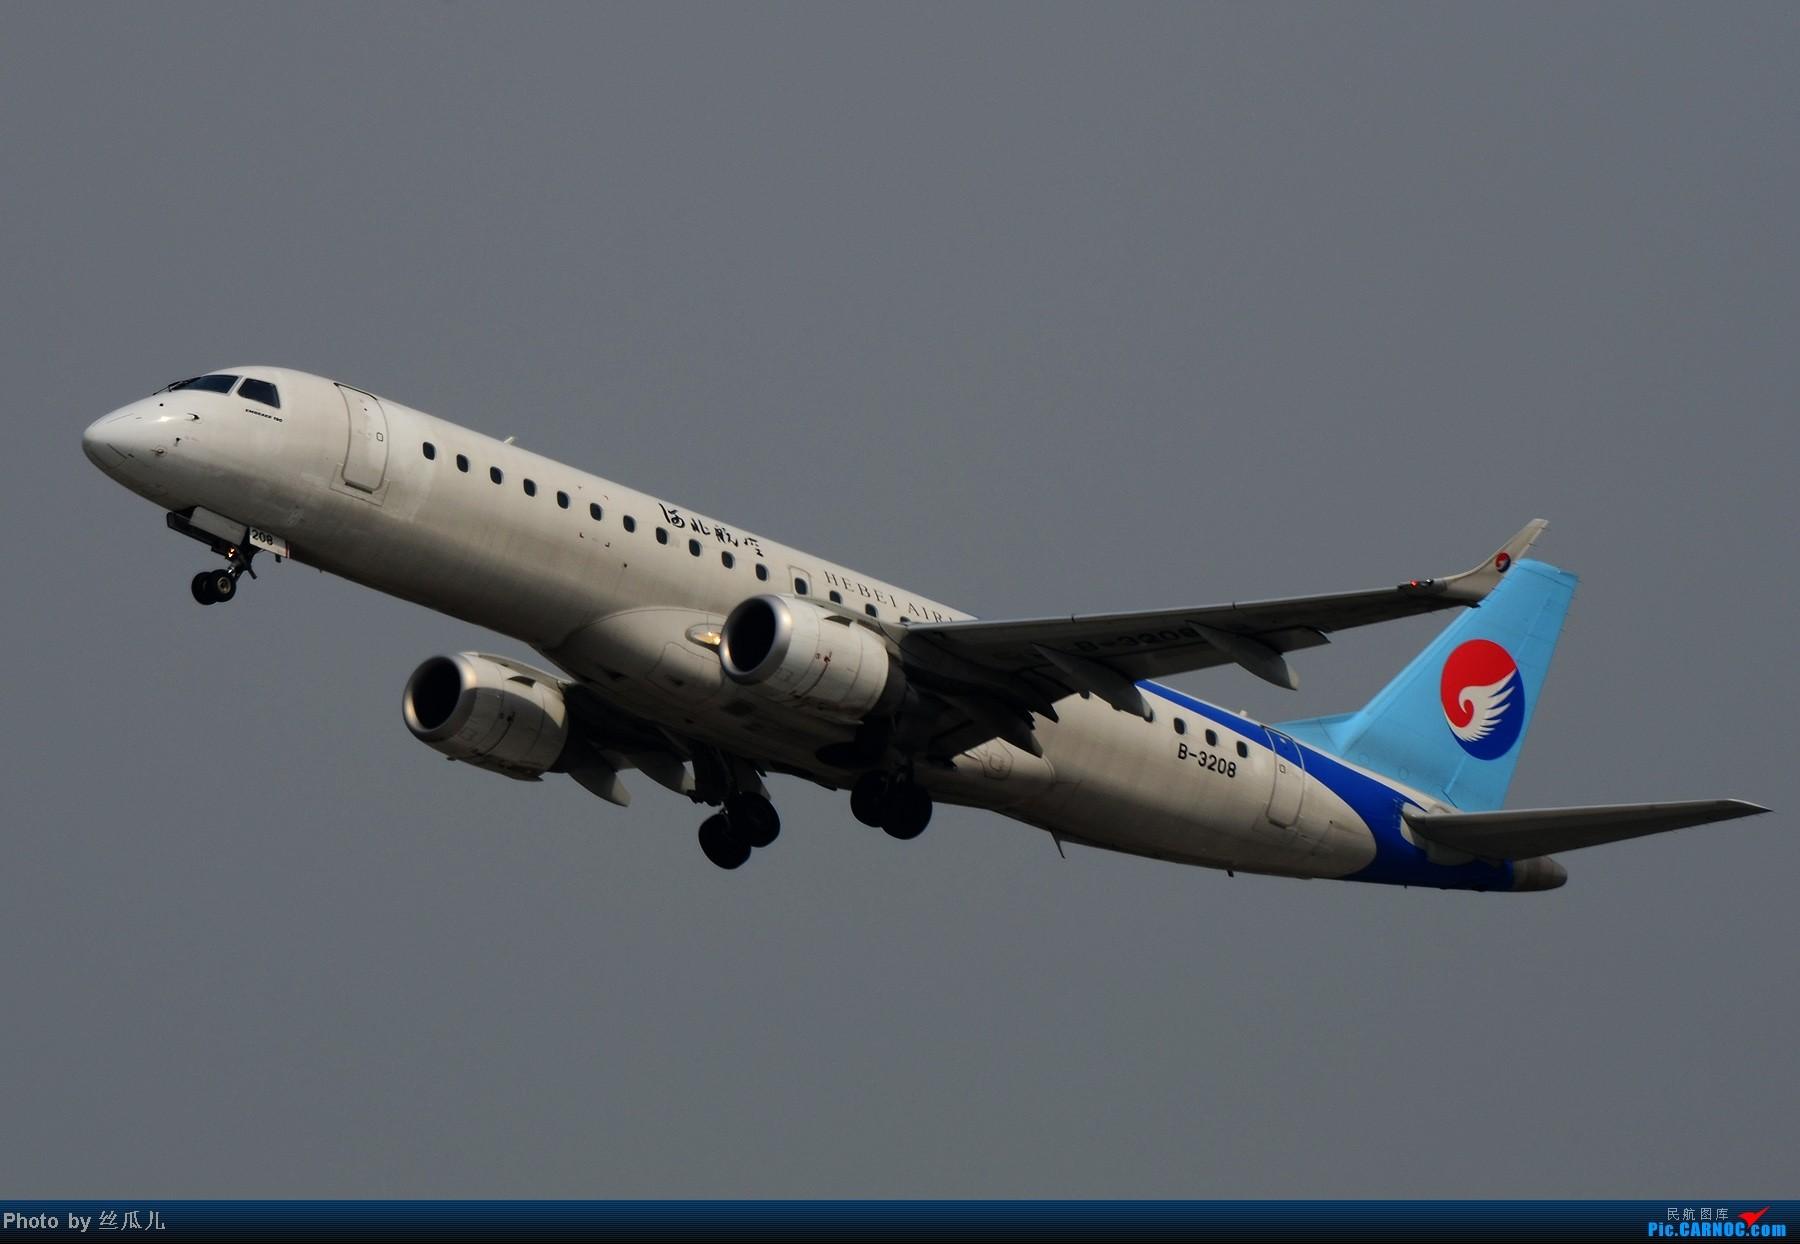 Re:[原创]2013年3月3日-萧山机场-晴 EMBRAER E-190 B-3208 中国杭州萧山机场